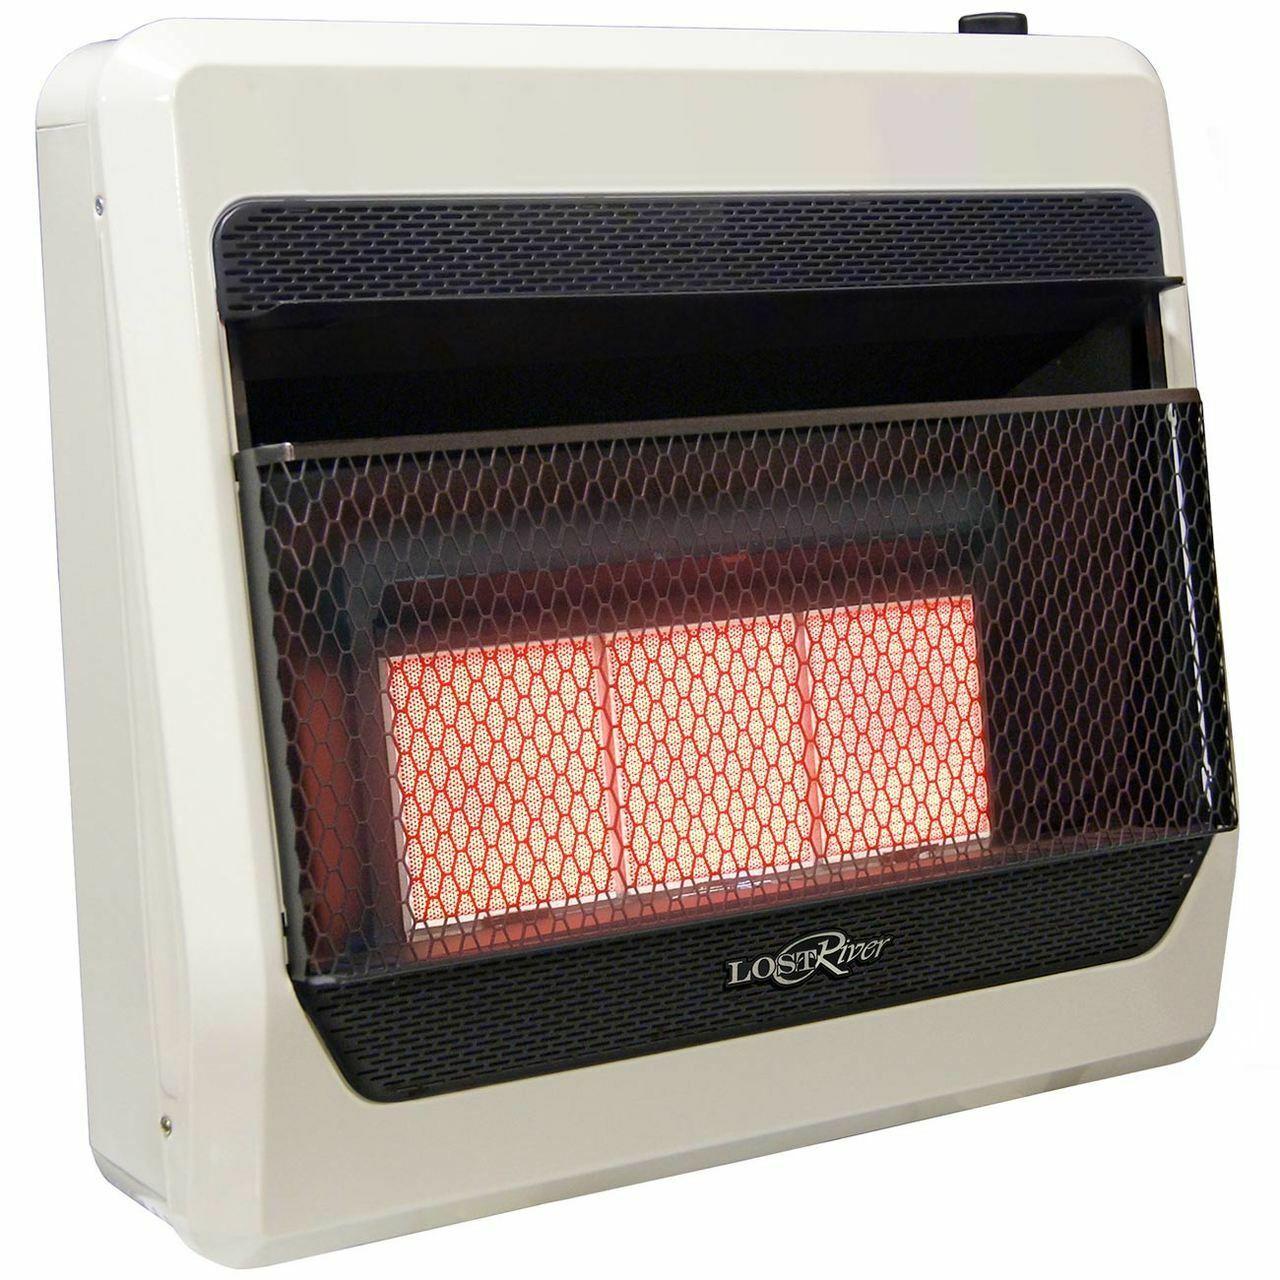 Lost River LR3TIR Ventless Propane Infrared Plaque Heater, V